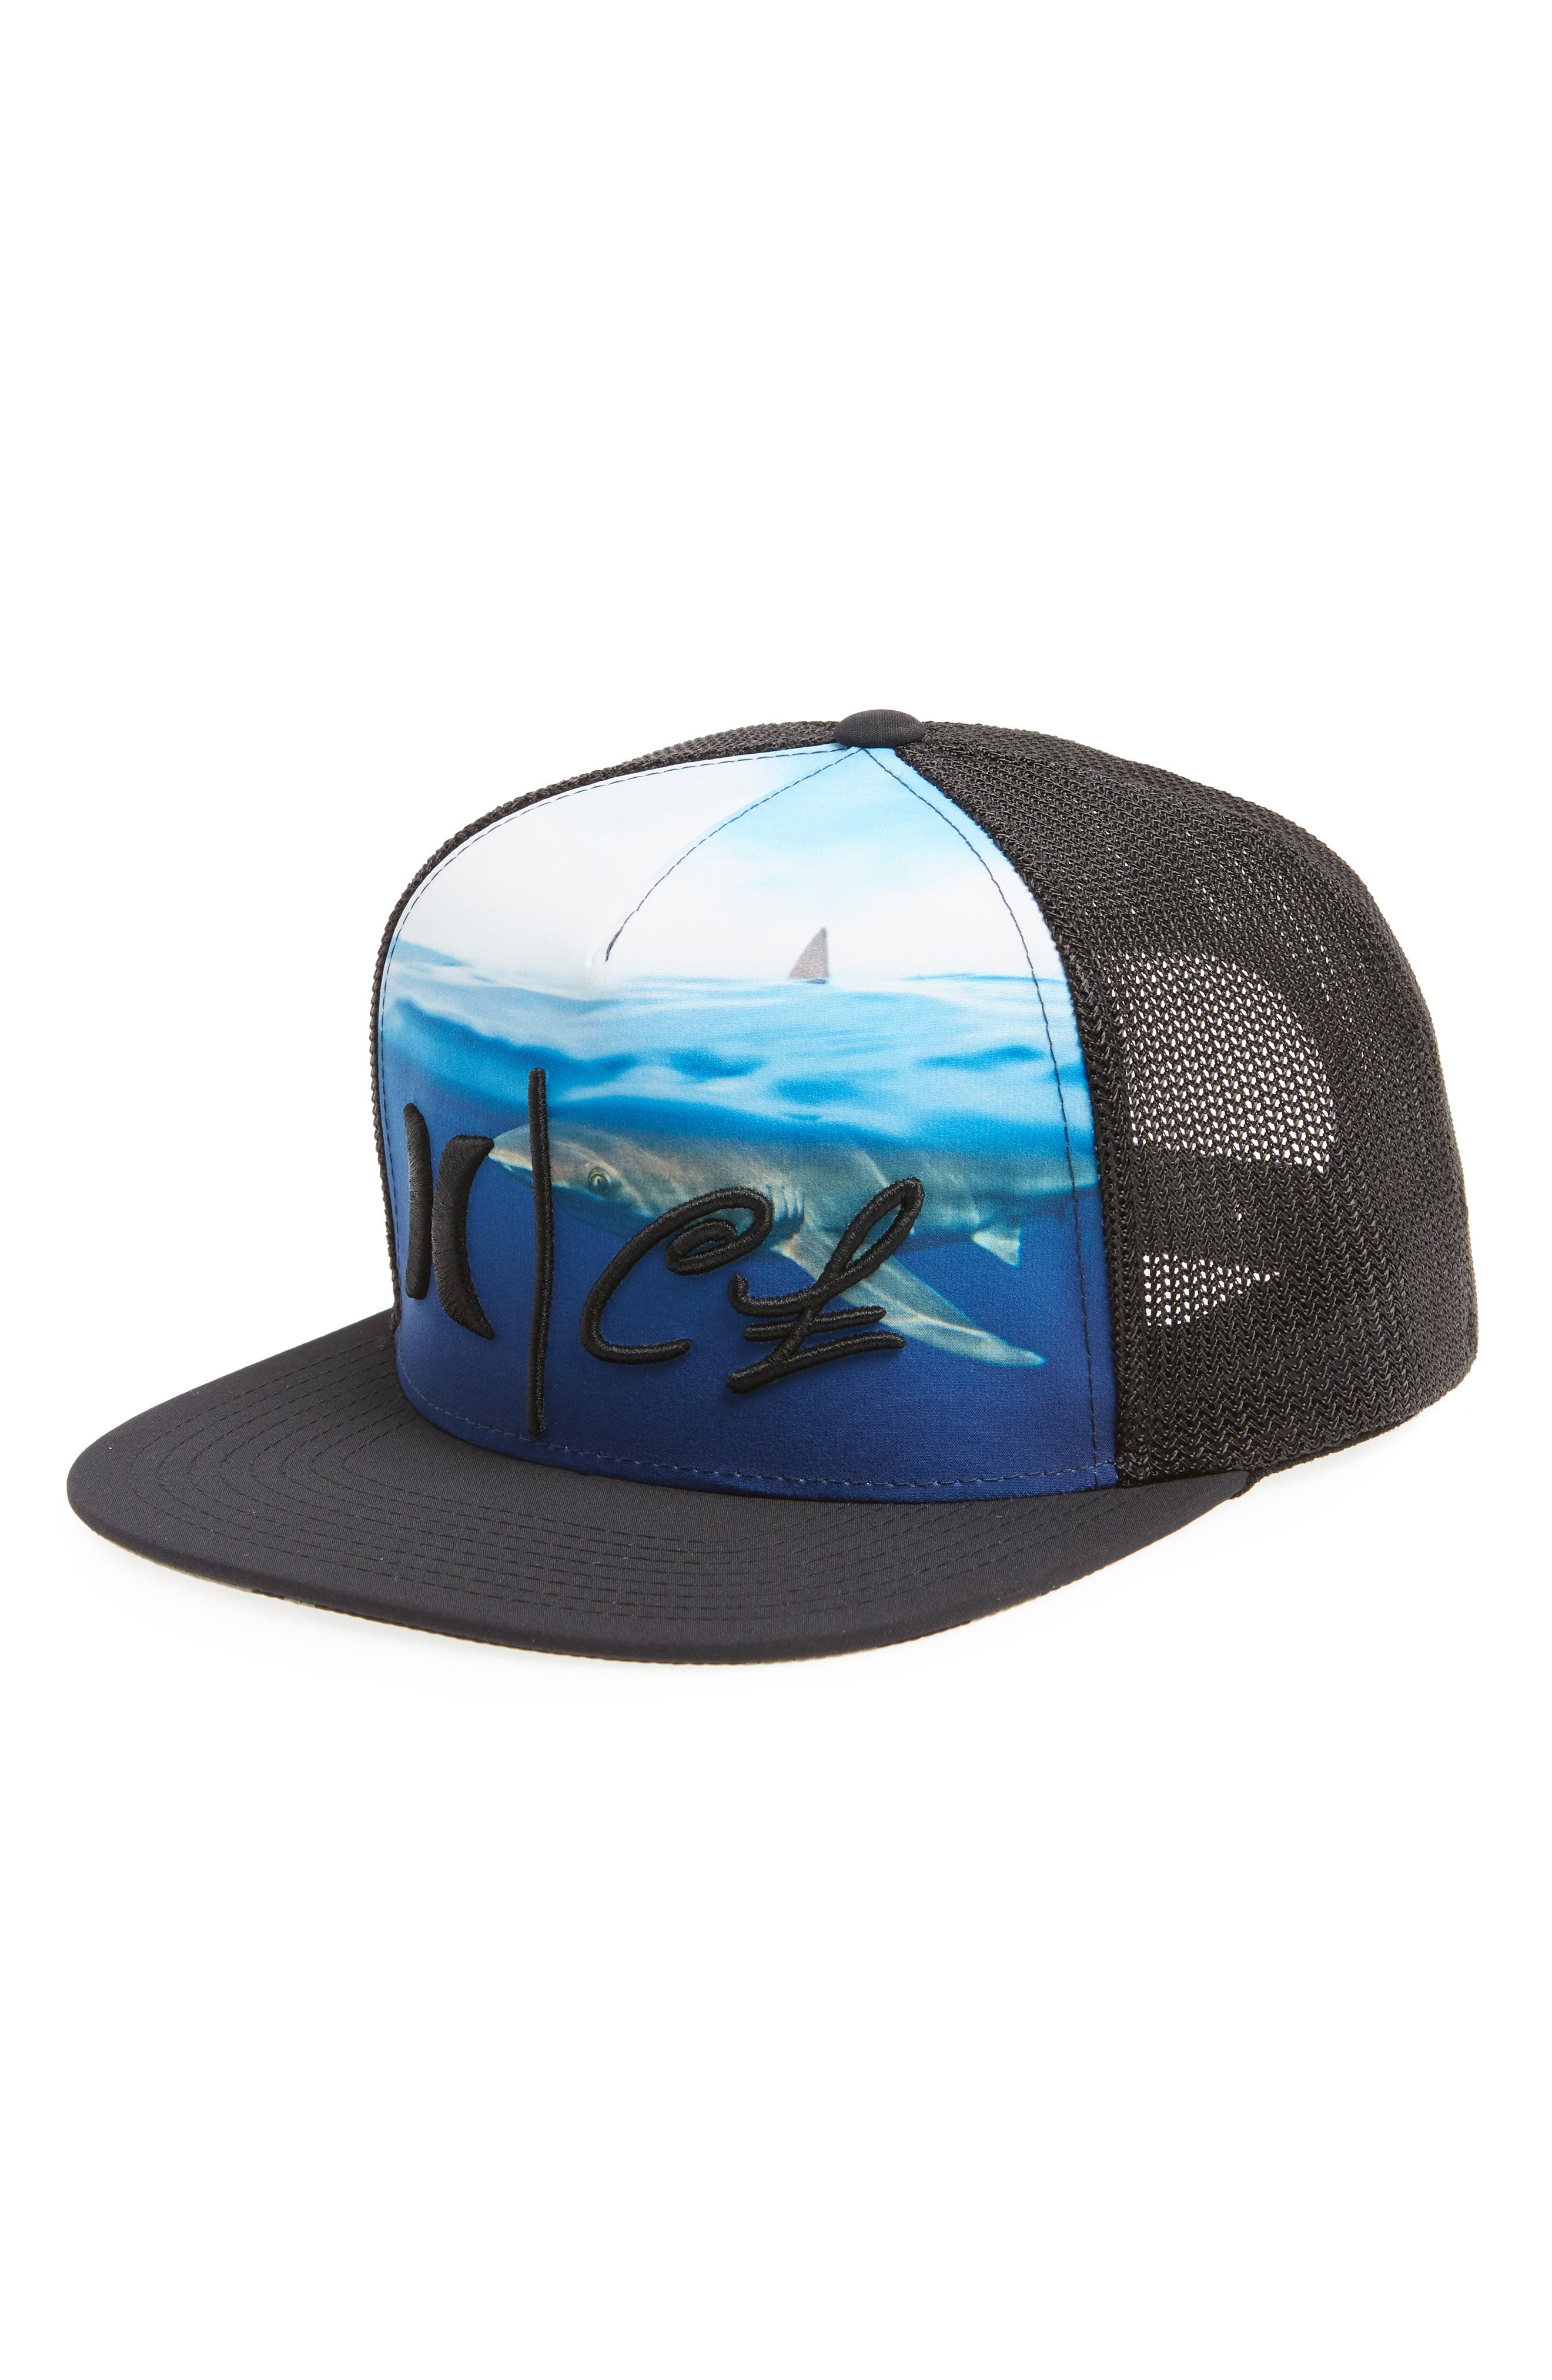 e578904b spain hurley hats shore cruiser bucket hat navy 185034 made of polyester  855a7 eae63; switzerland hurley clark little shark trucker hat a1b0f fc157